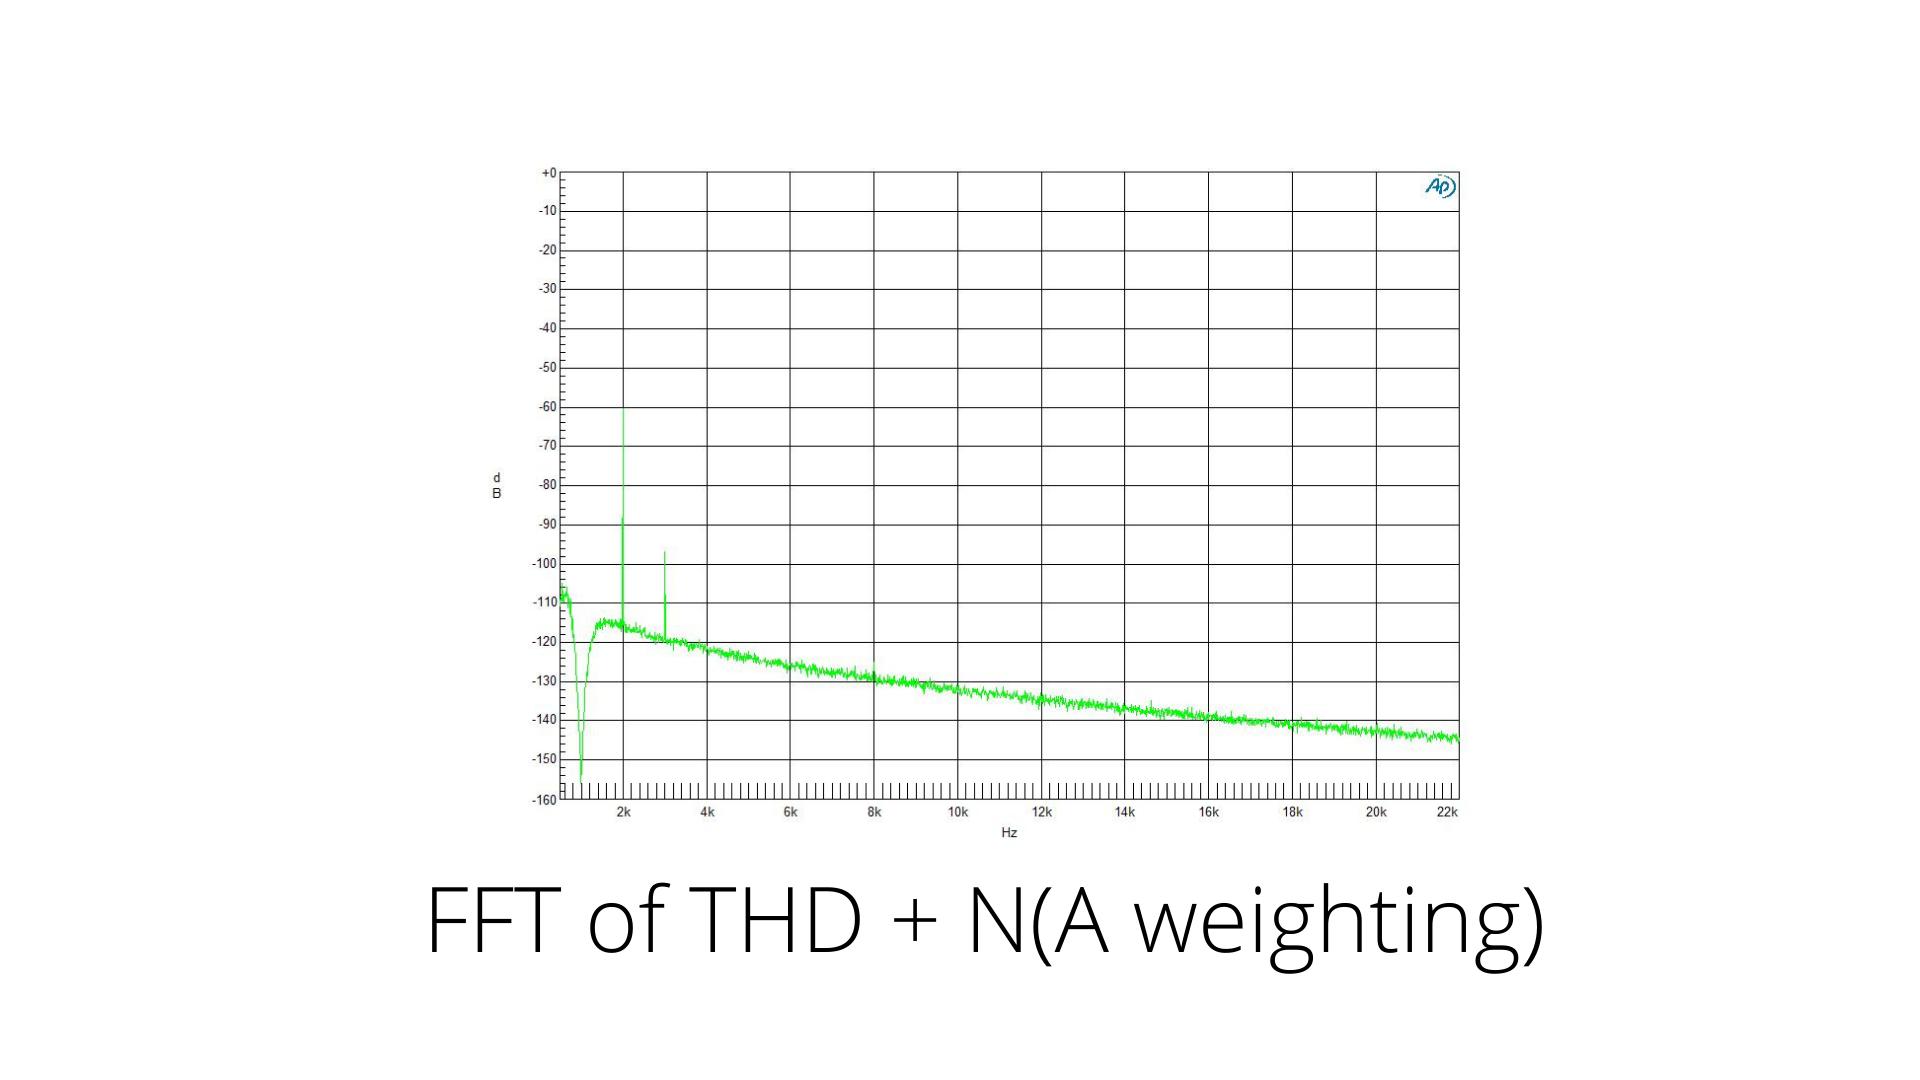 FFT of THD + N(A weighting) 클래식 포노 프리앰프 nagra 베스트 best top